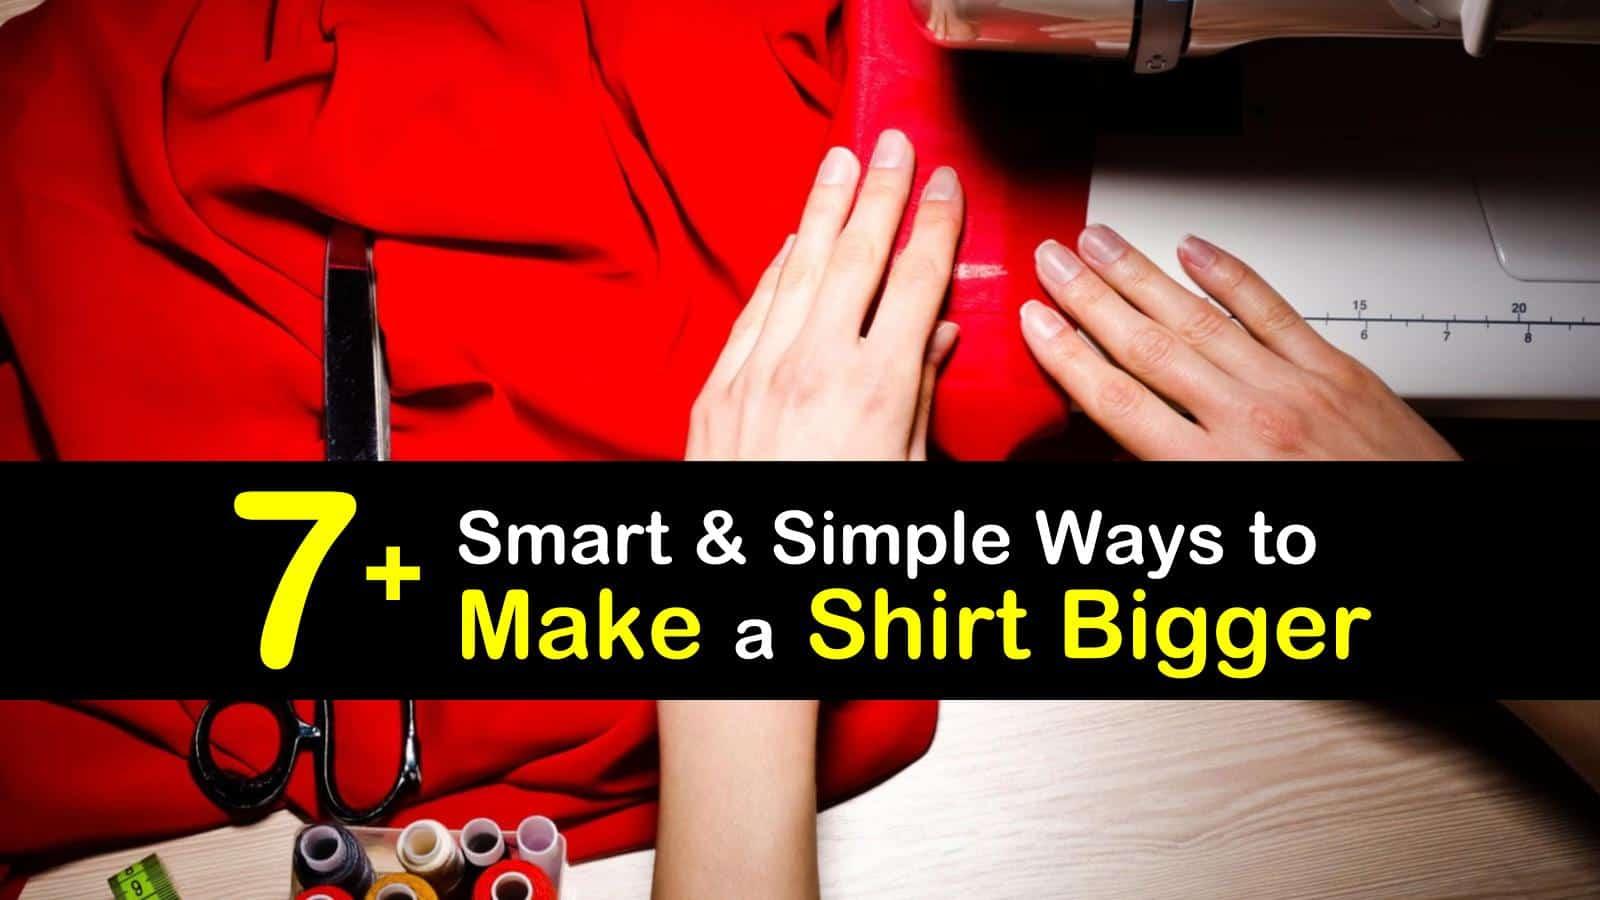 12+ Smart & Simple Ways to Make a Shirt Bigger